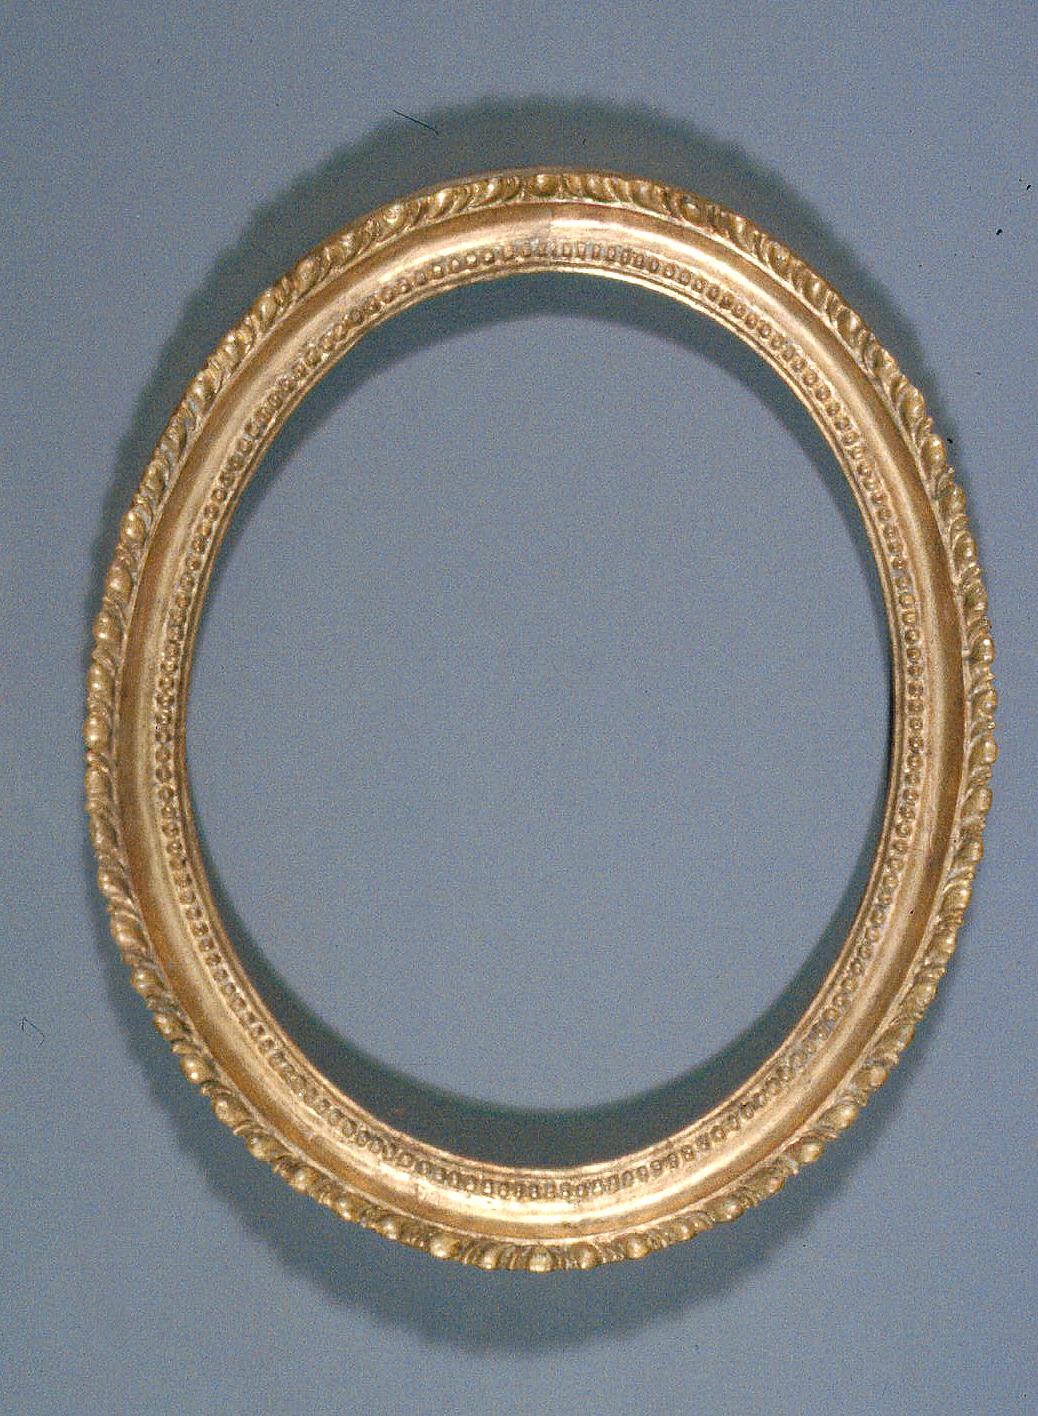 Oval_gilded_frame-02-AT